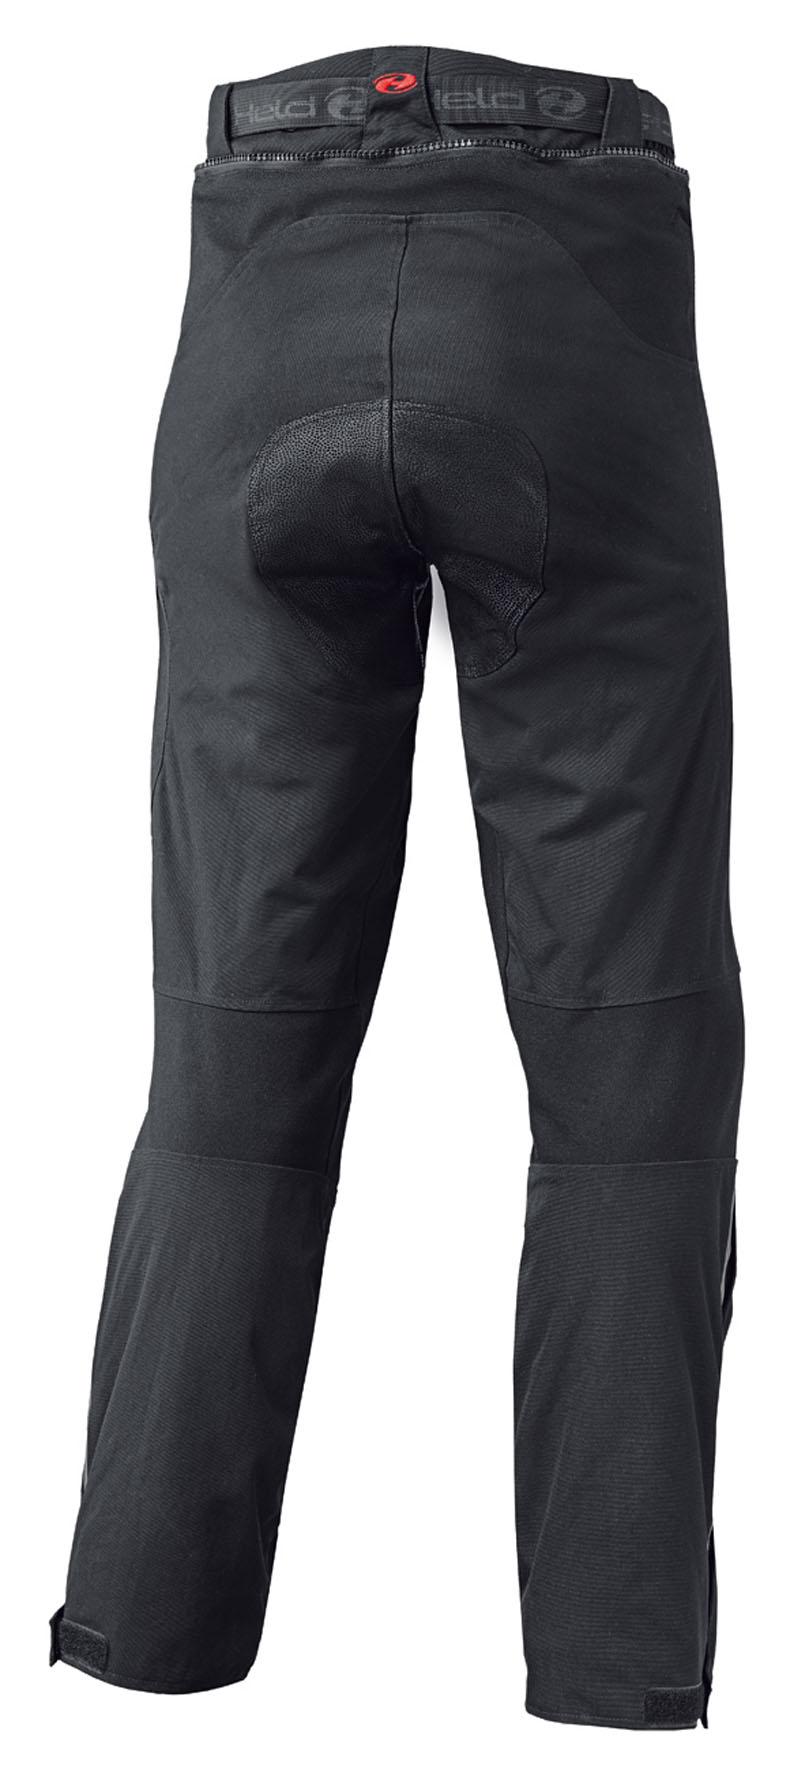 HELD - Pantalonne MURDOCK (Art.6669-Col.01)(Retro)-2